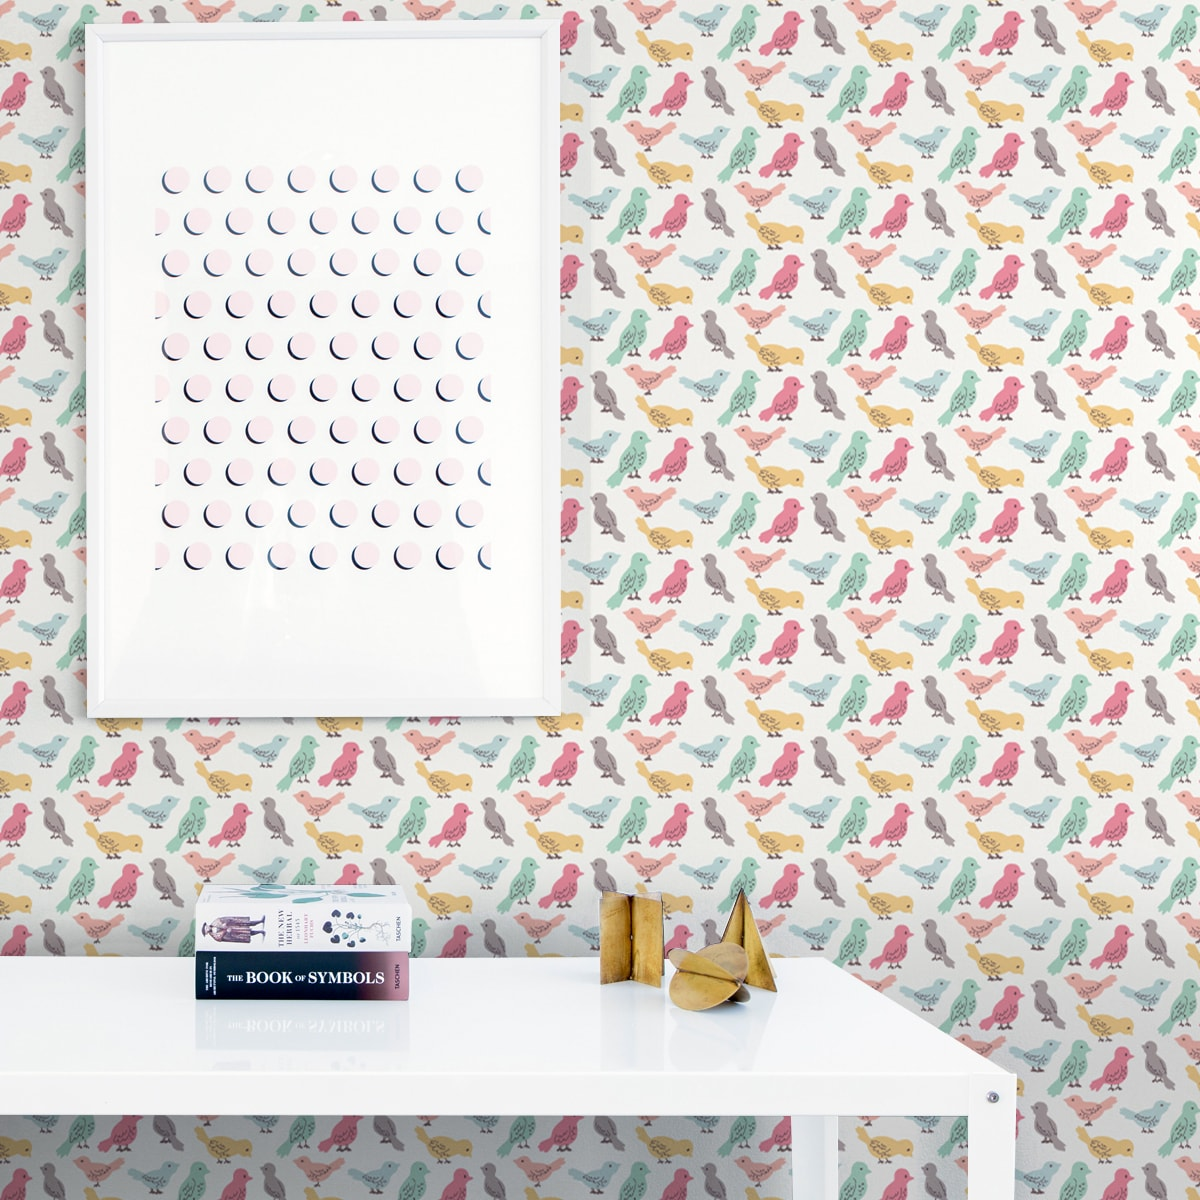 Wandtapete weiss: lustige Design Tapete